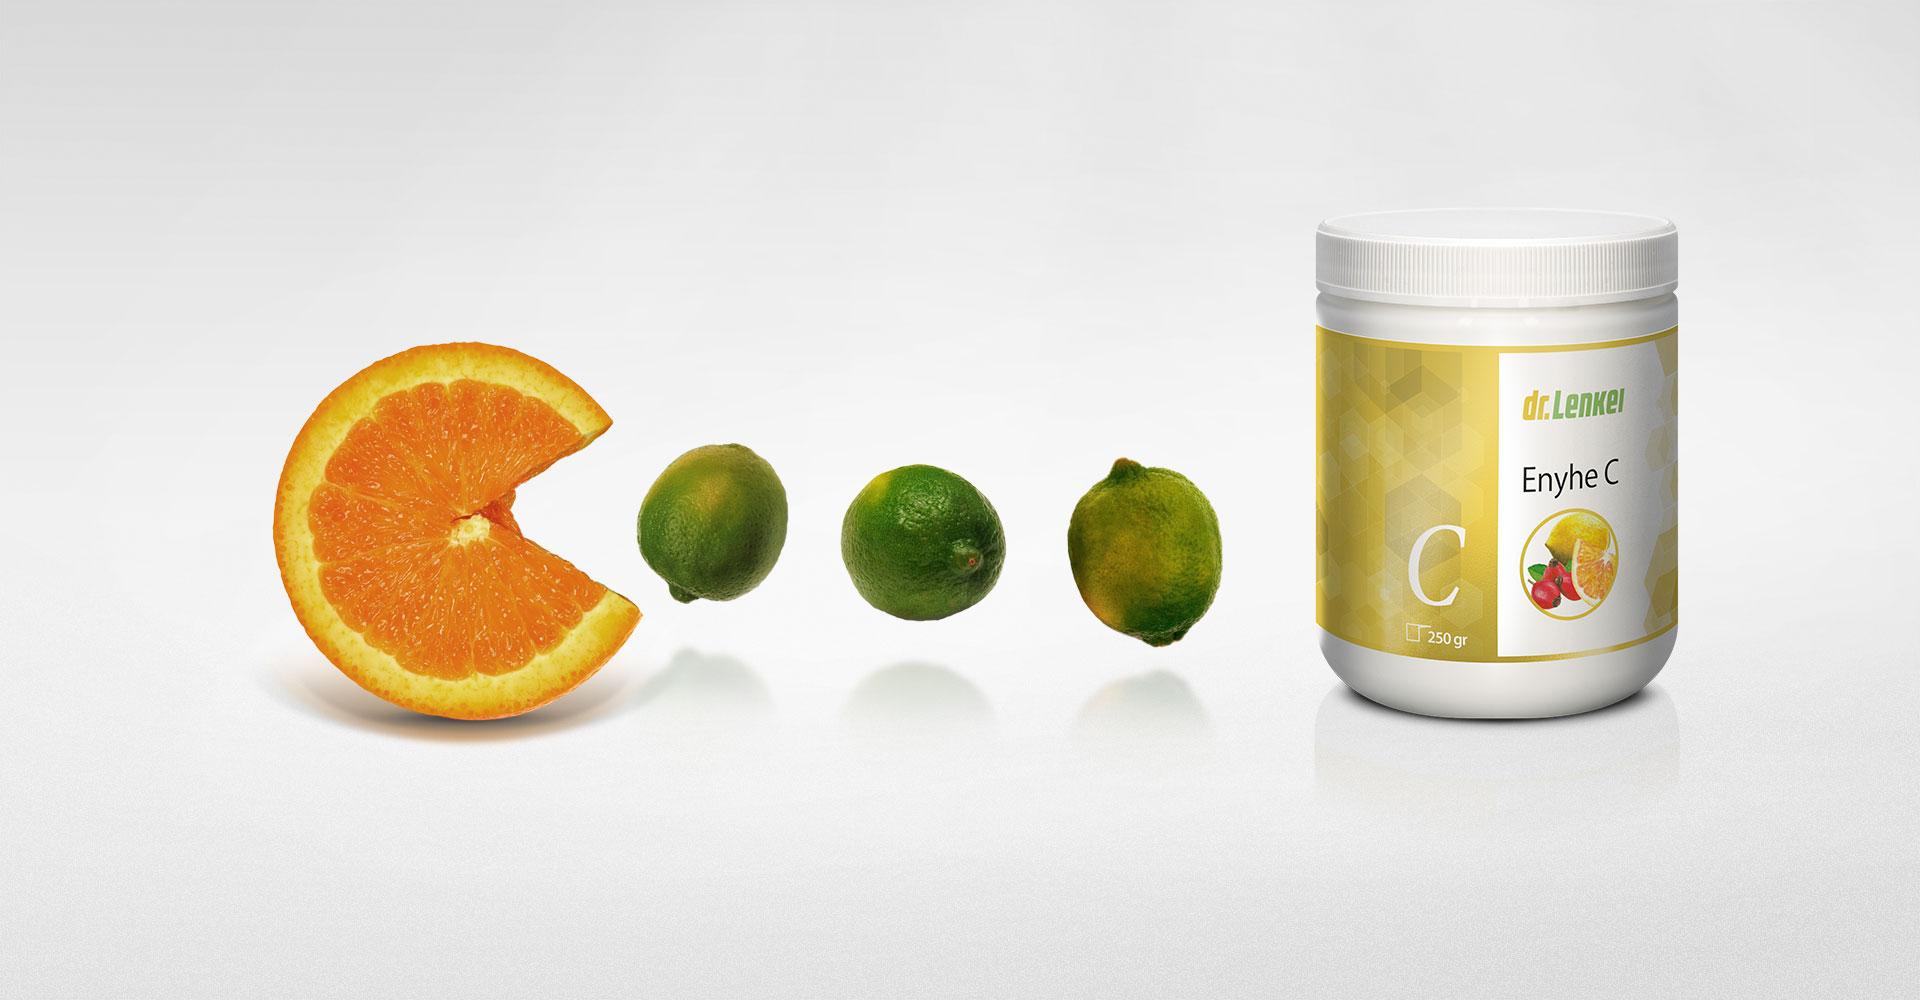 Dr. Lenkei Enyhe C vitamin